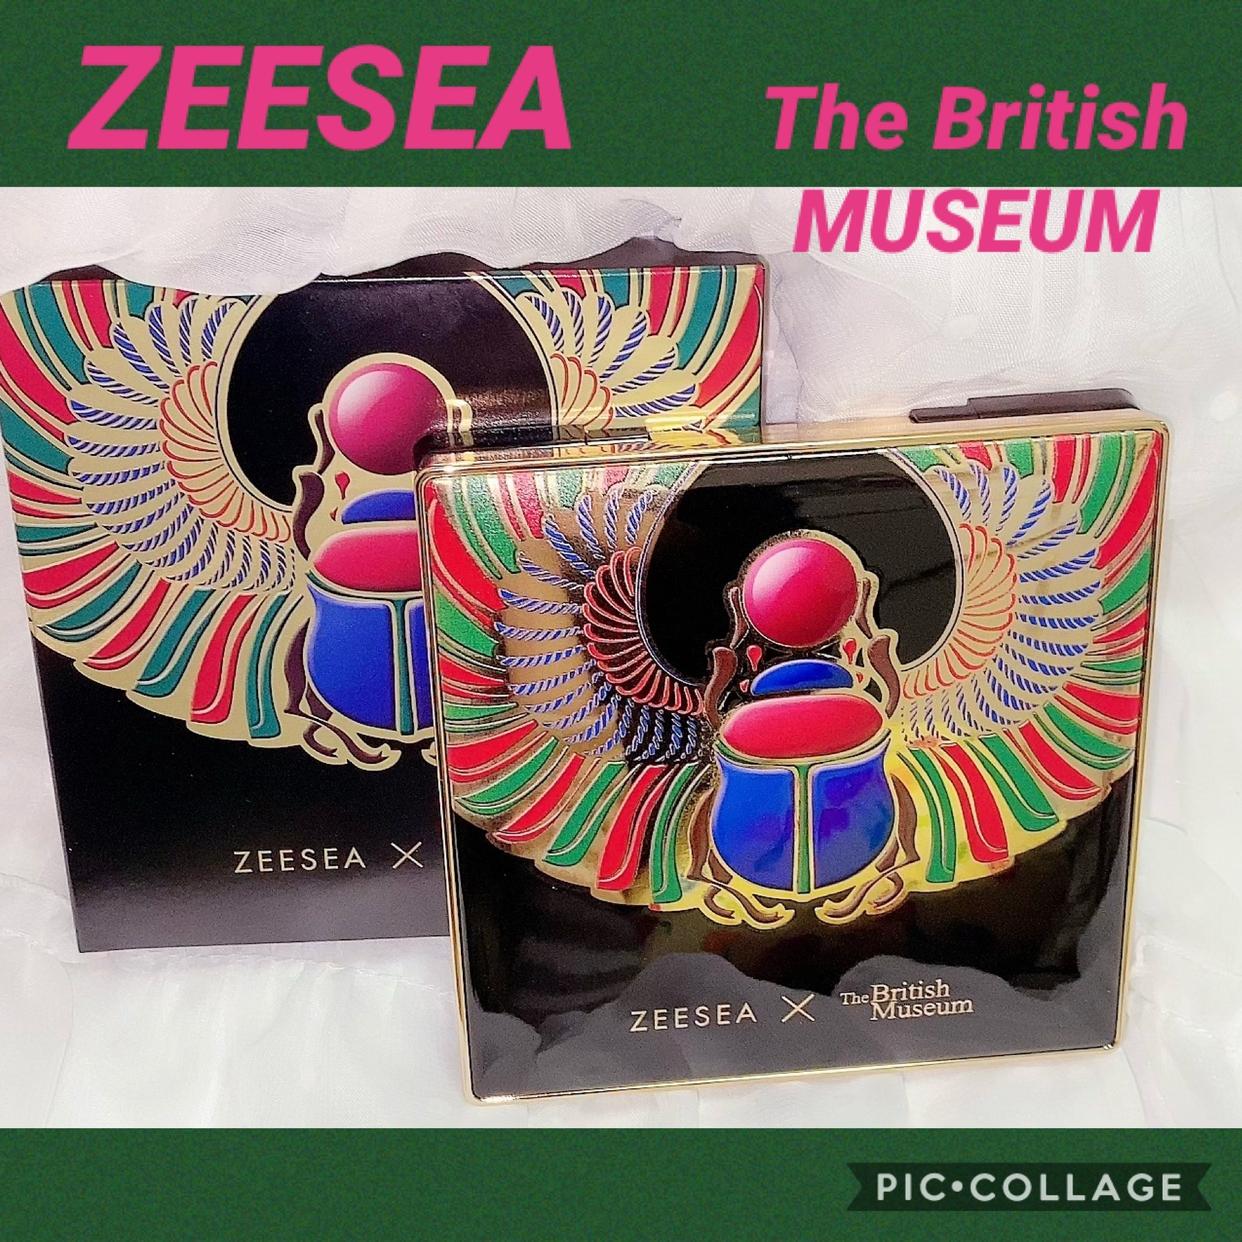 ZEESEA(ズーシー) 大英博物館 16色スクエアアイシャドウパレットを使った珈琲豆♡さんのクチコミ画像